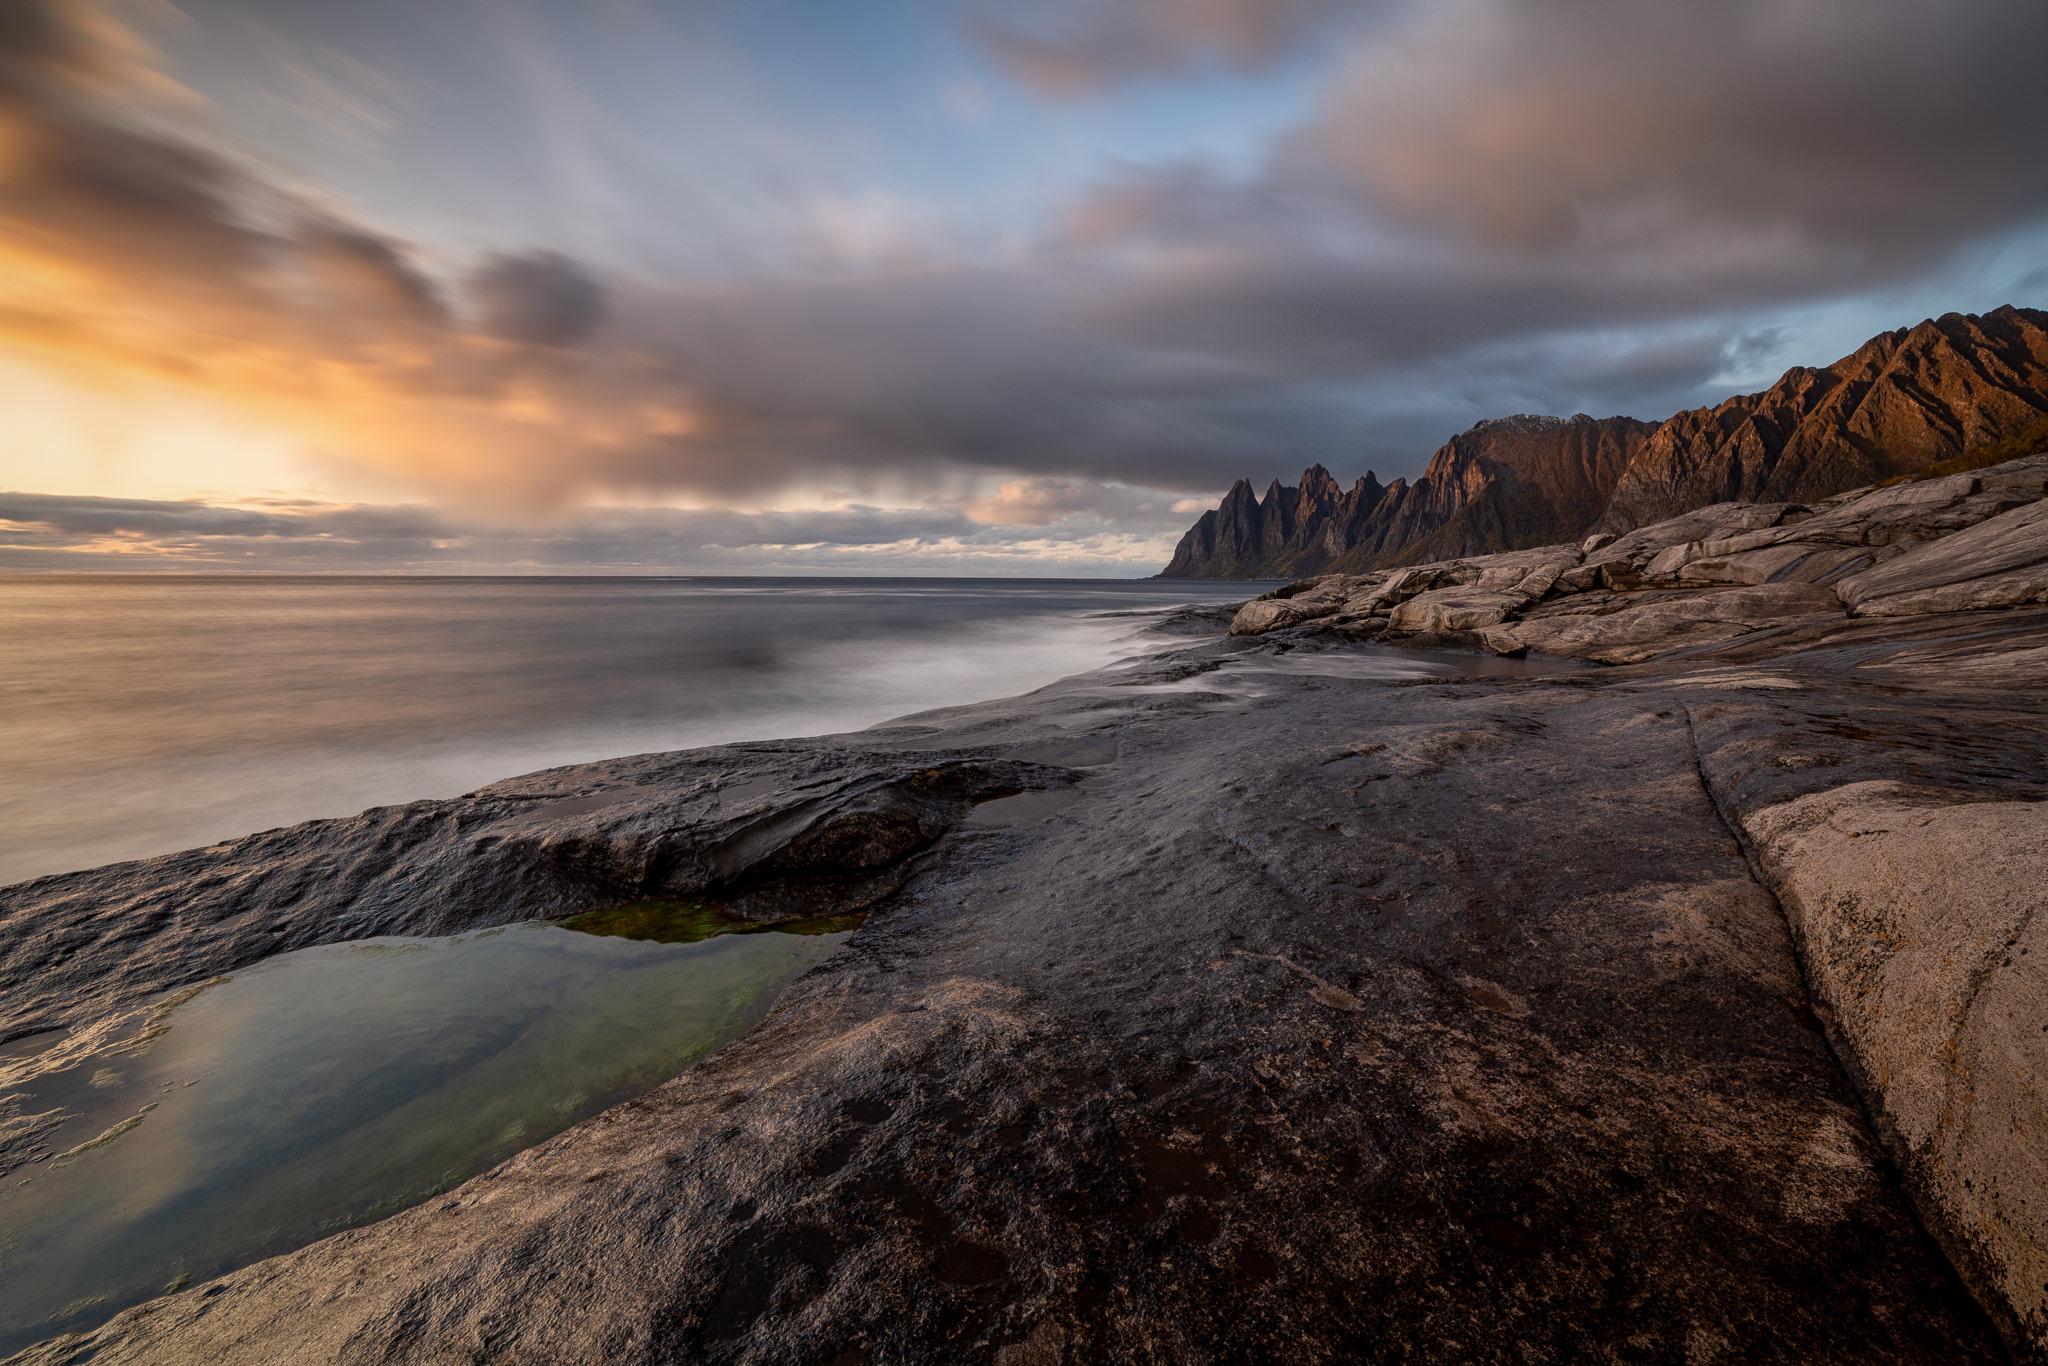 Teufelszähne auf Senja zum Sonnenuntergang, Lofoten, Norwegen, Fotoscout